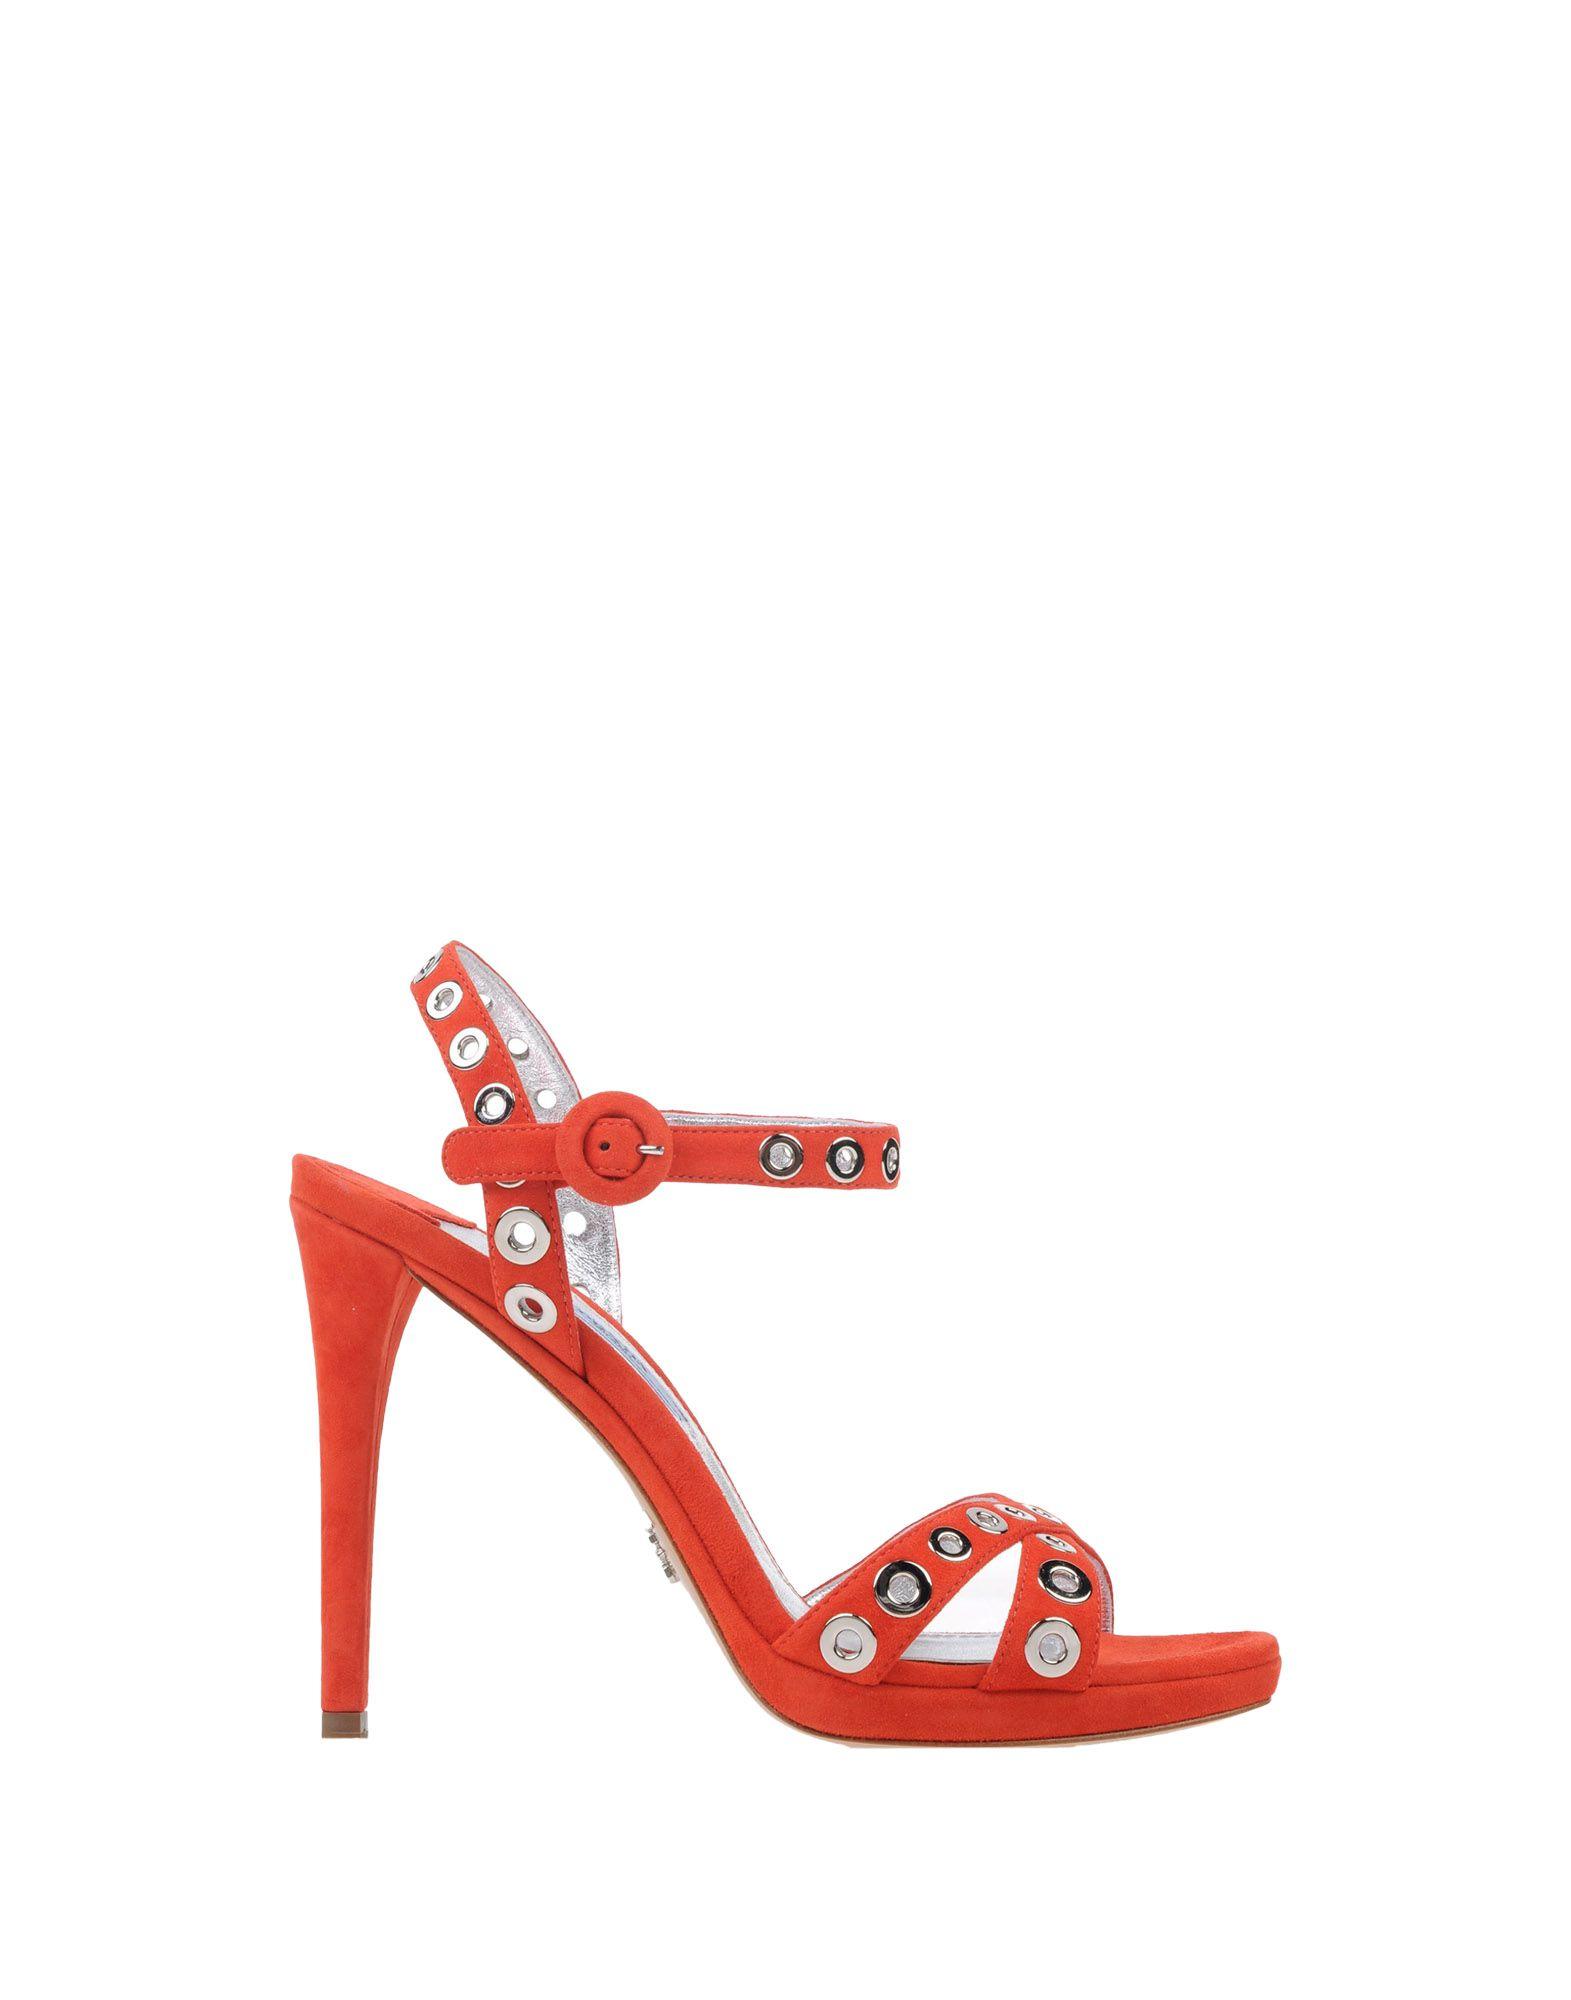 Prada Sandalen Damen   11130622AB Heiße Schuhe 2f5c5a